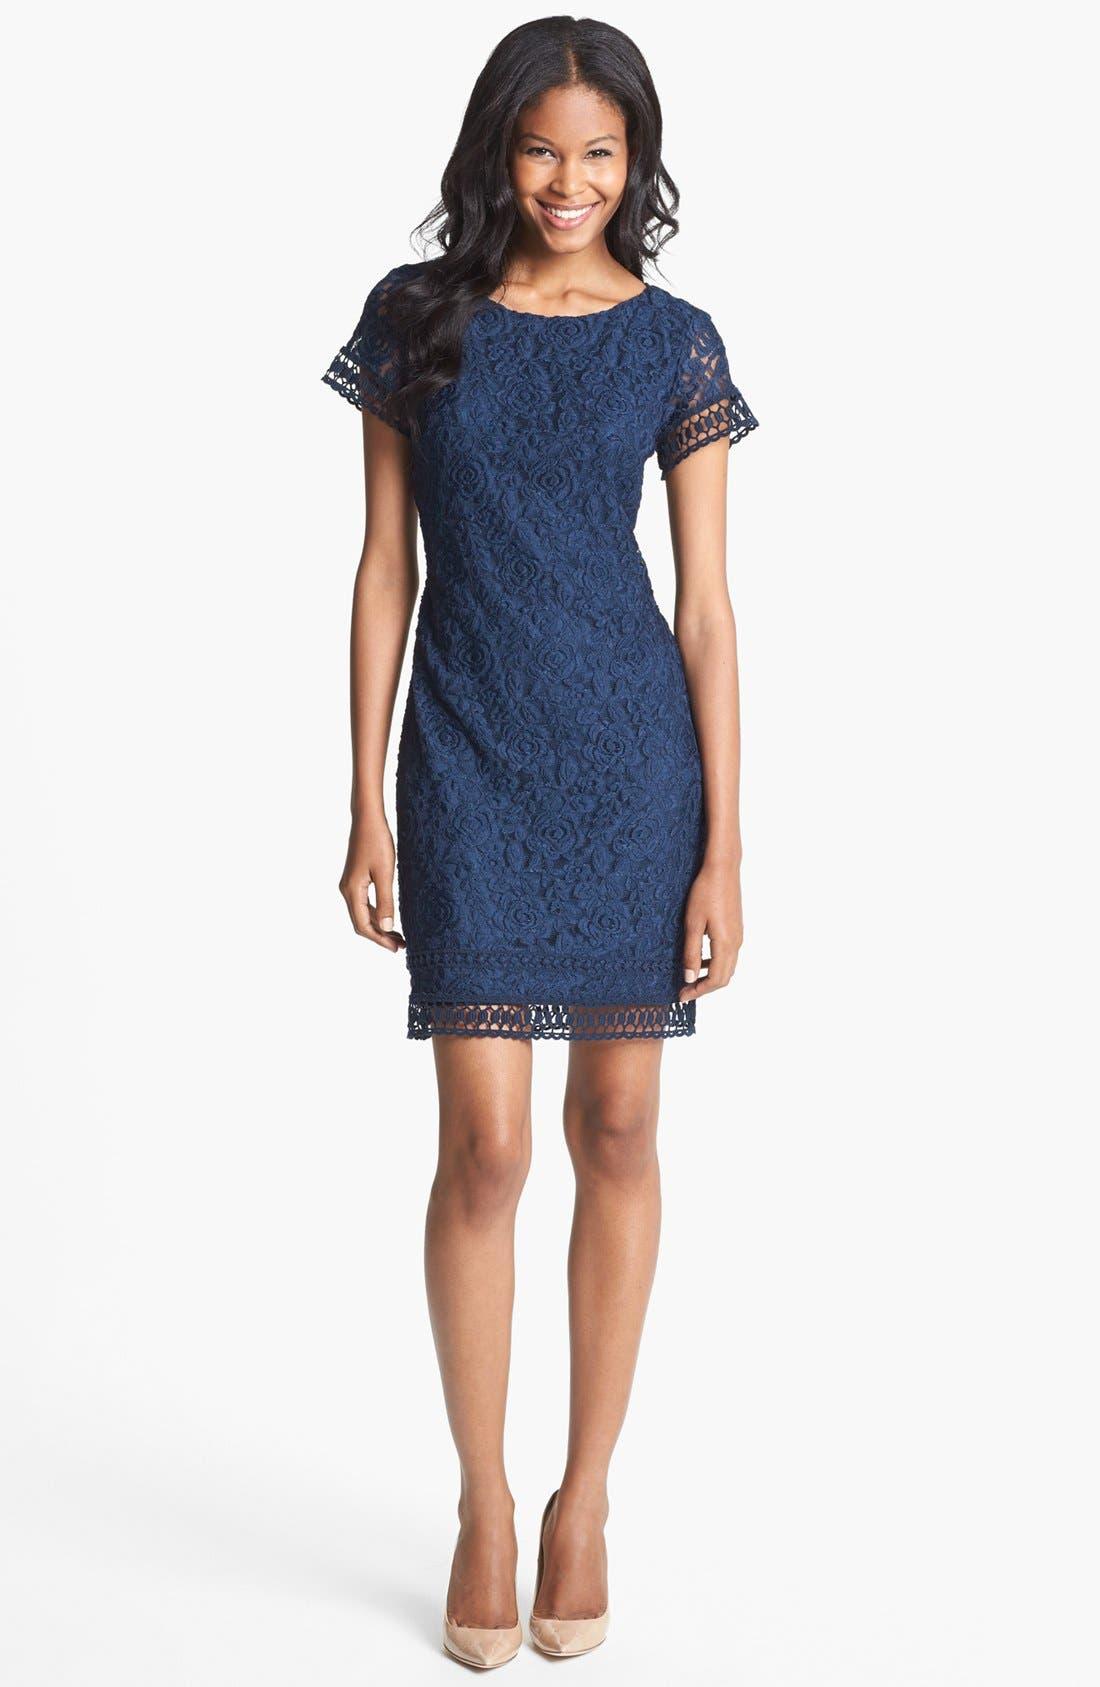 Alternate Image 1 Selected - Laundry by Shelli Segal Lace Sheath Dress